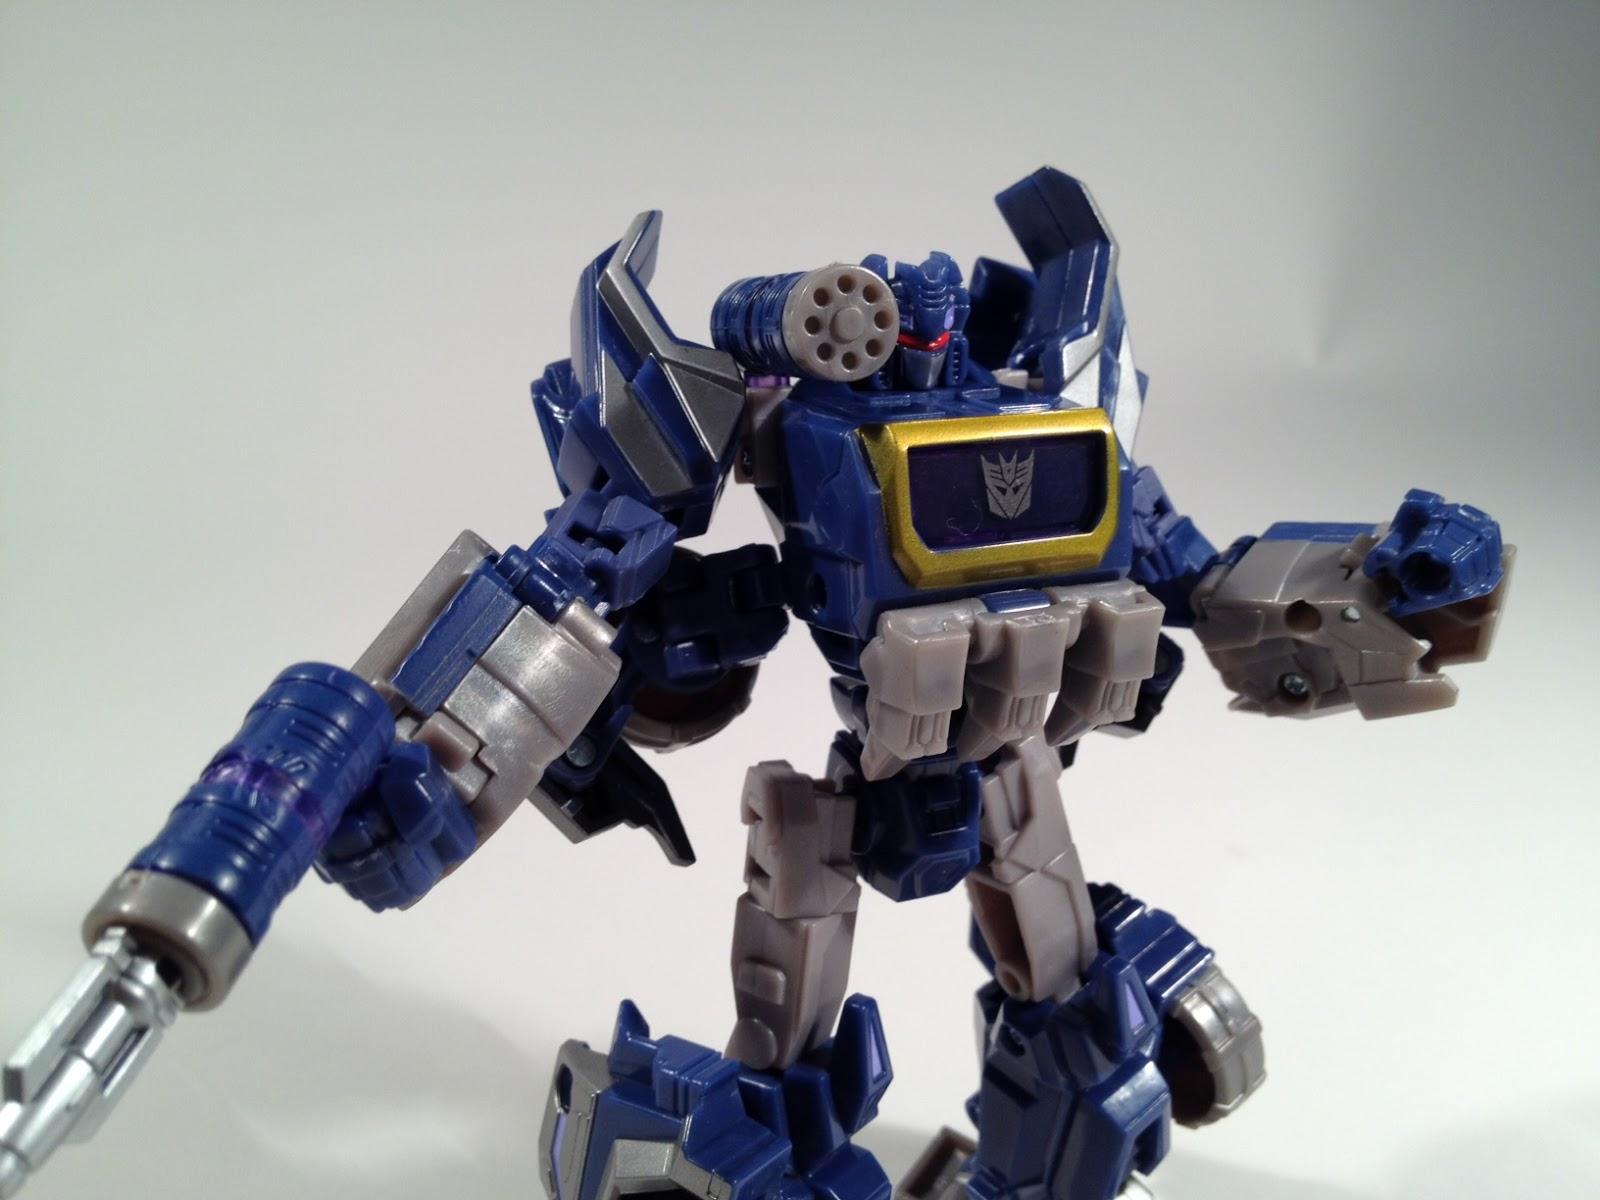 Rusted Mecha: Transformers Generations Cybertronian Soundwave